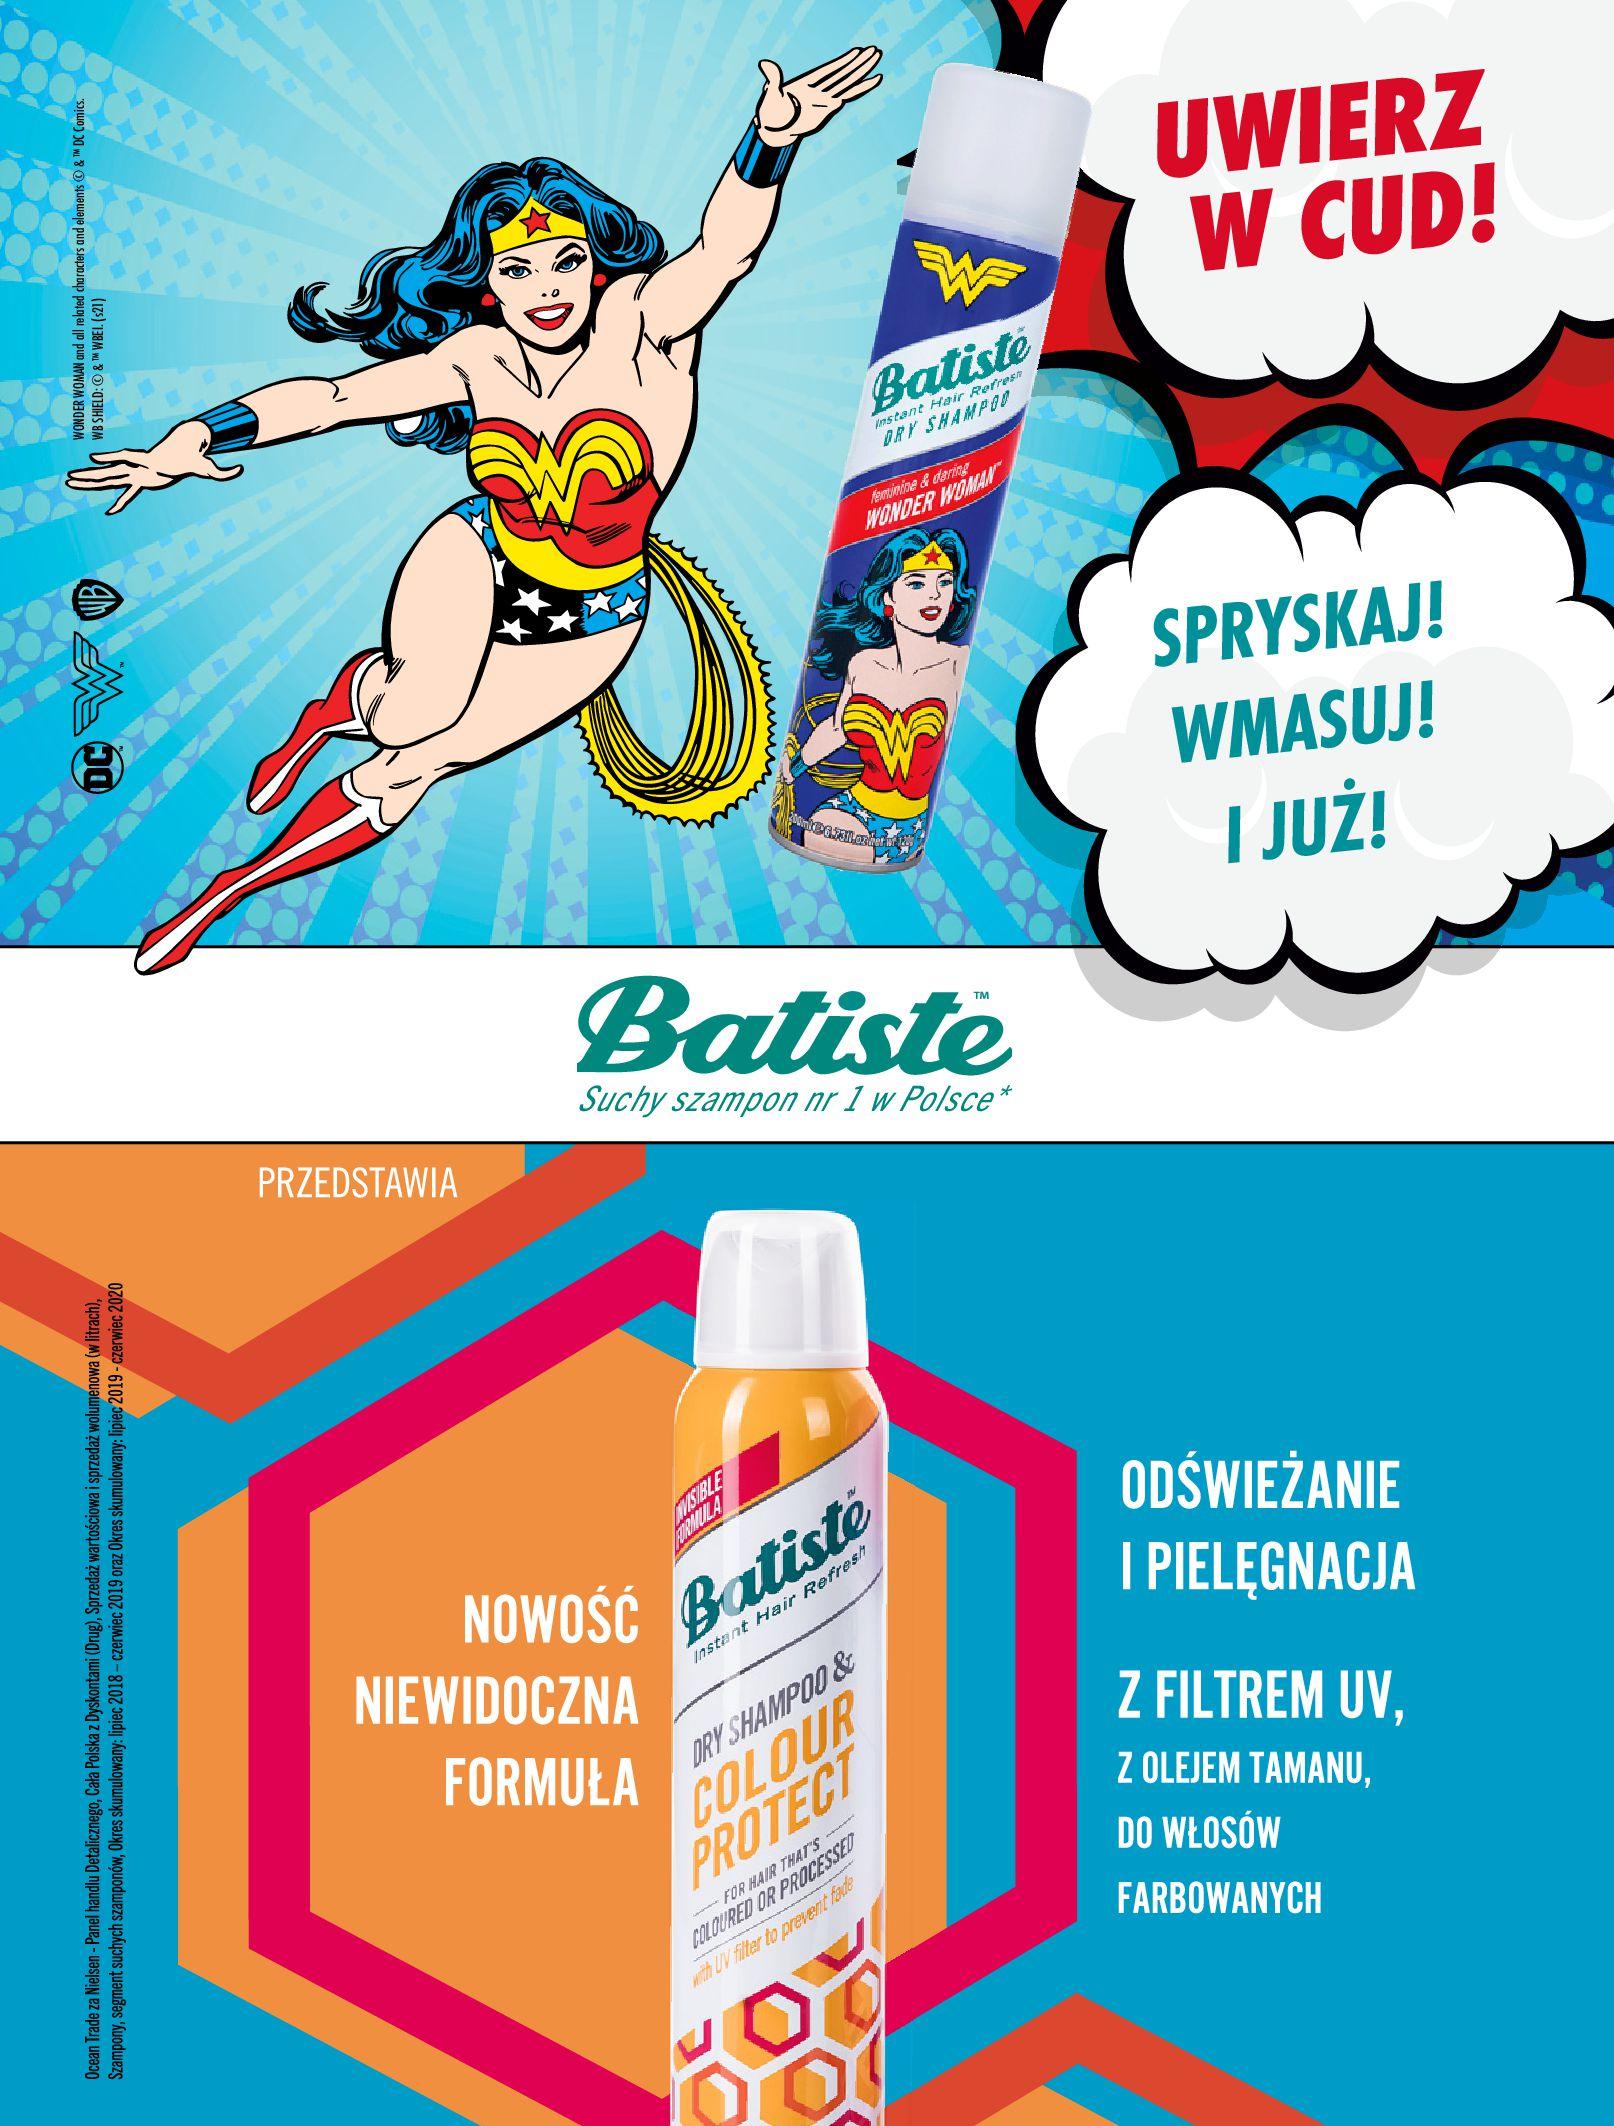 Gazetka hebe: Magazyn Hebe - Trendy na lato 2021-07-01 page-71